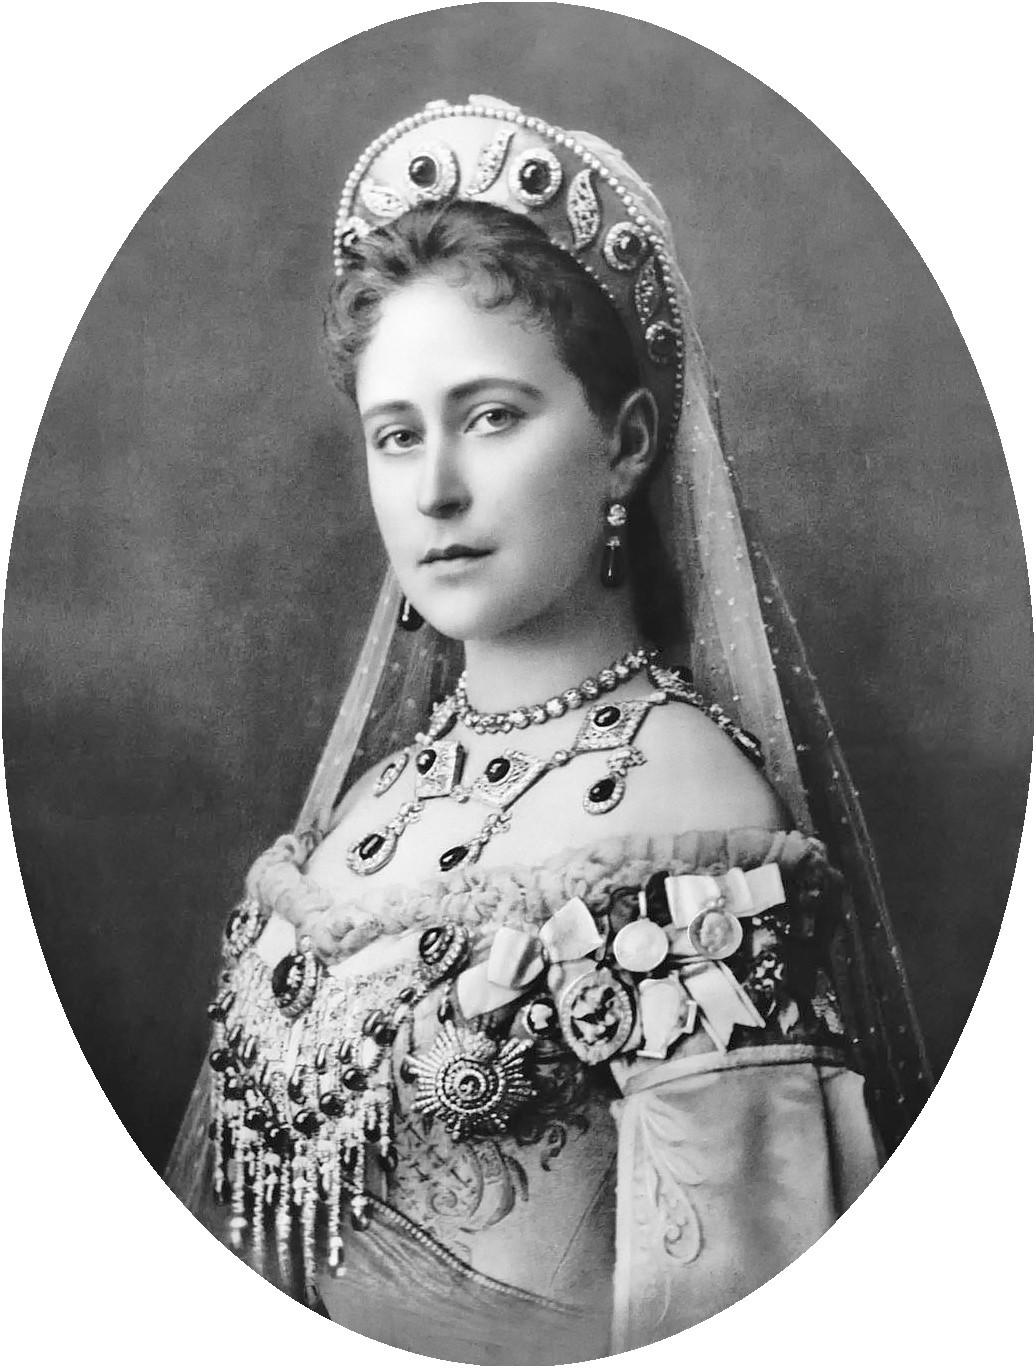 Portrait of the Grand Duchess Elizabeth, 1896